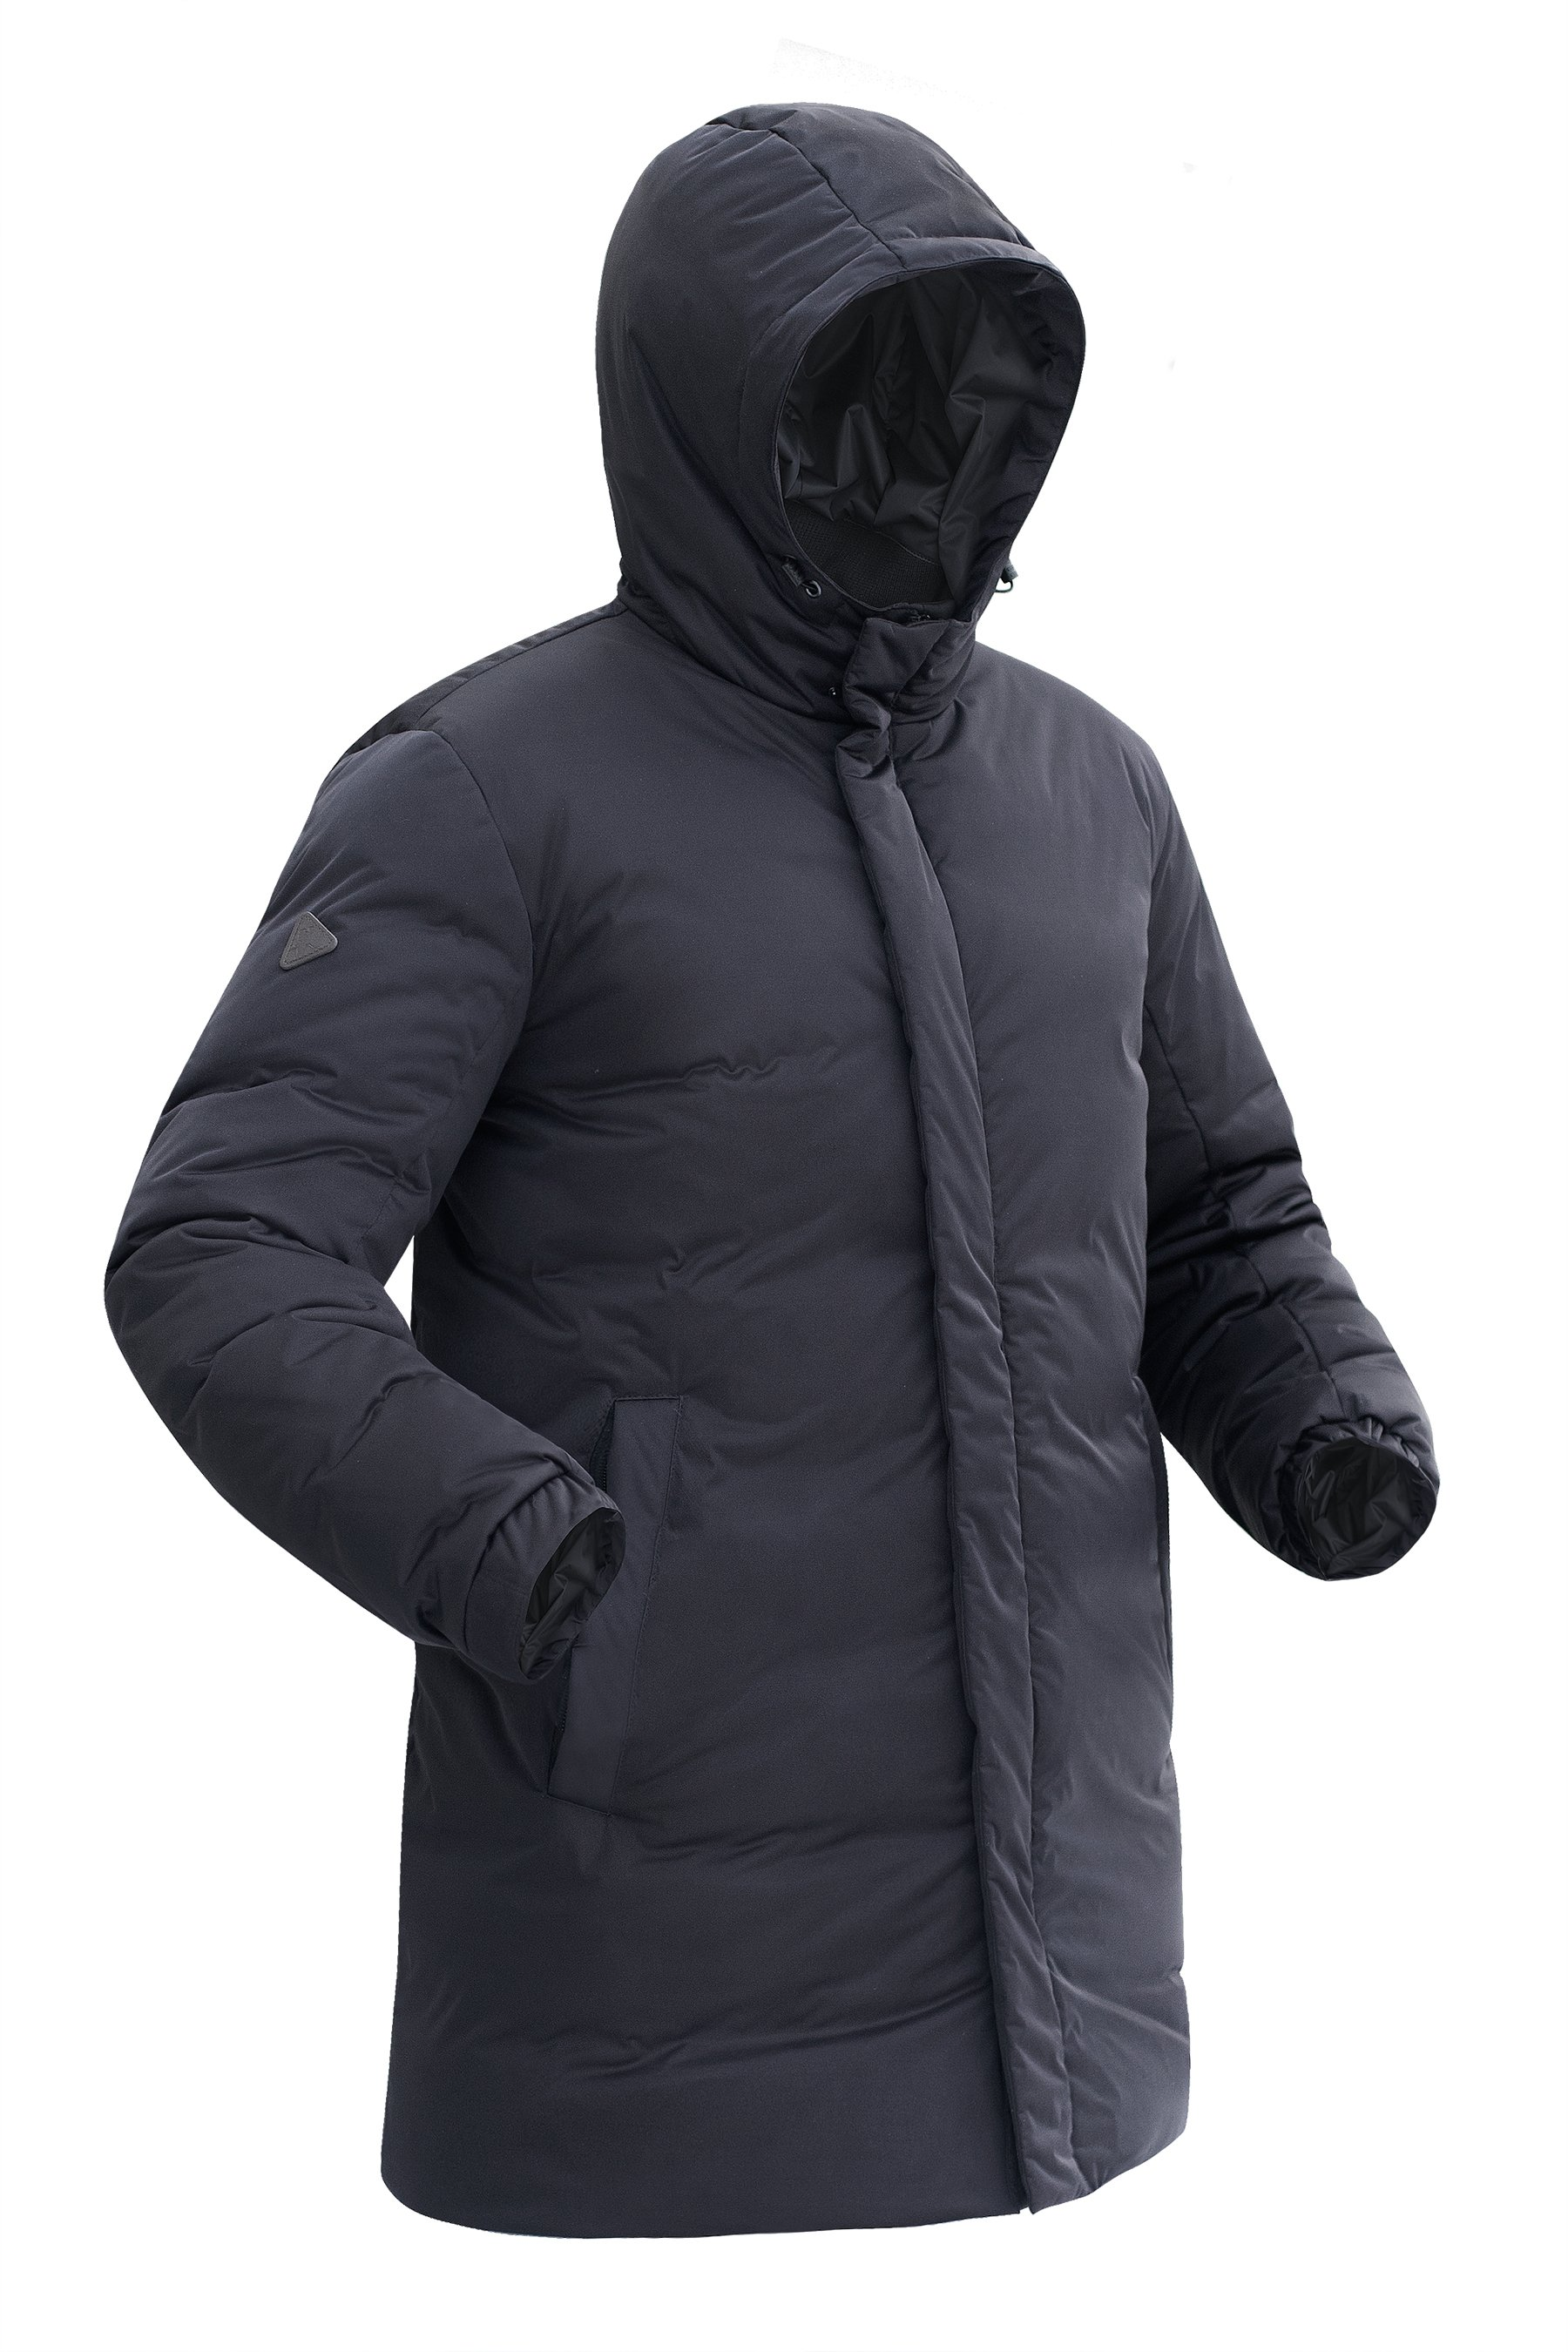 Пуховая куртка BASK ICEBERG LUX 5451